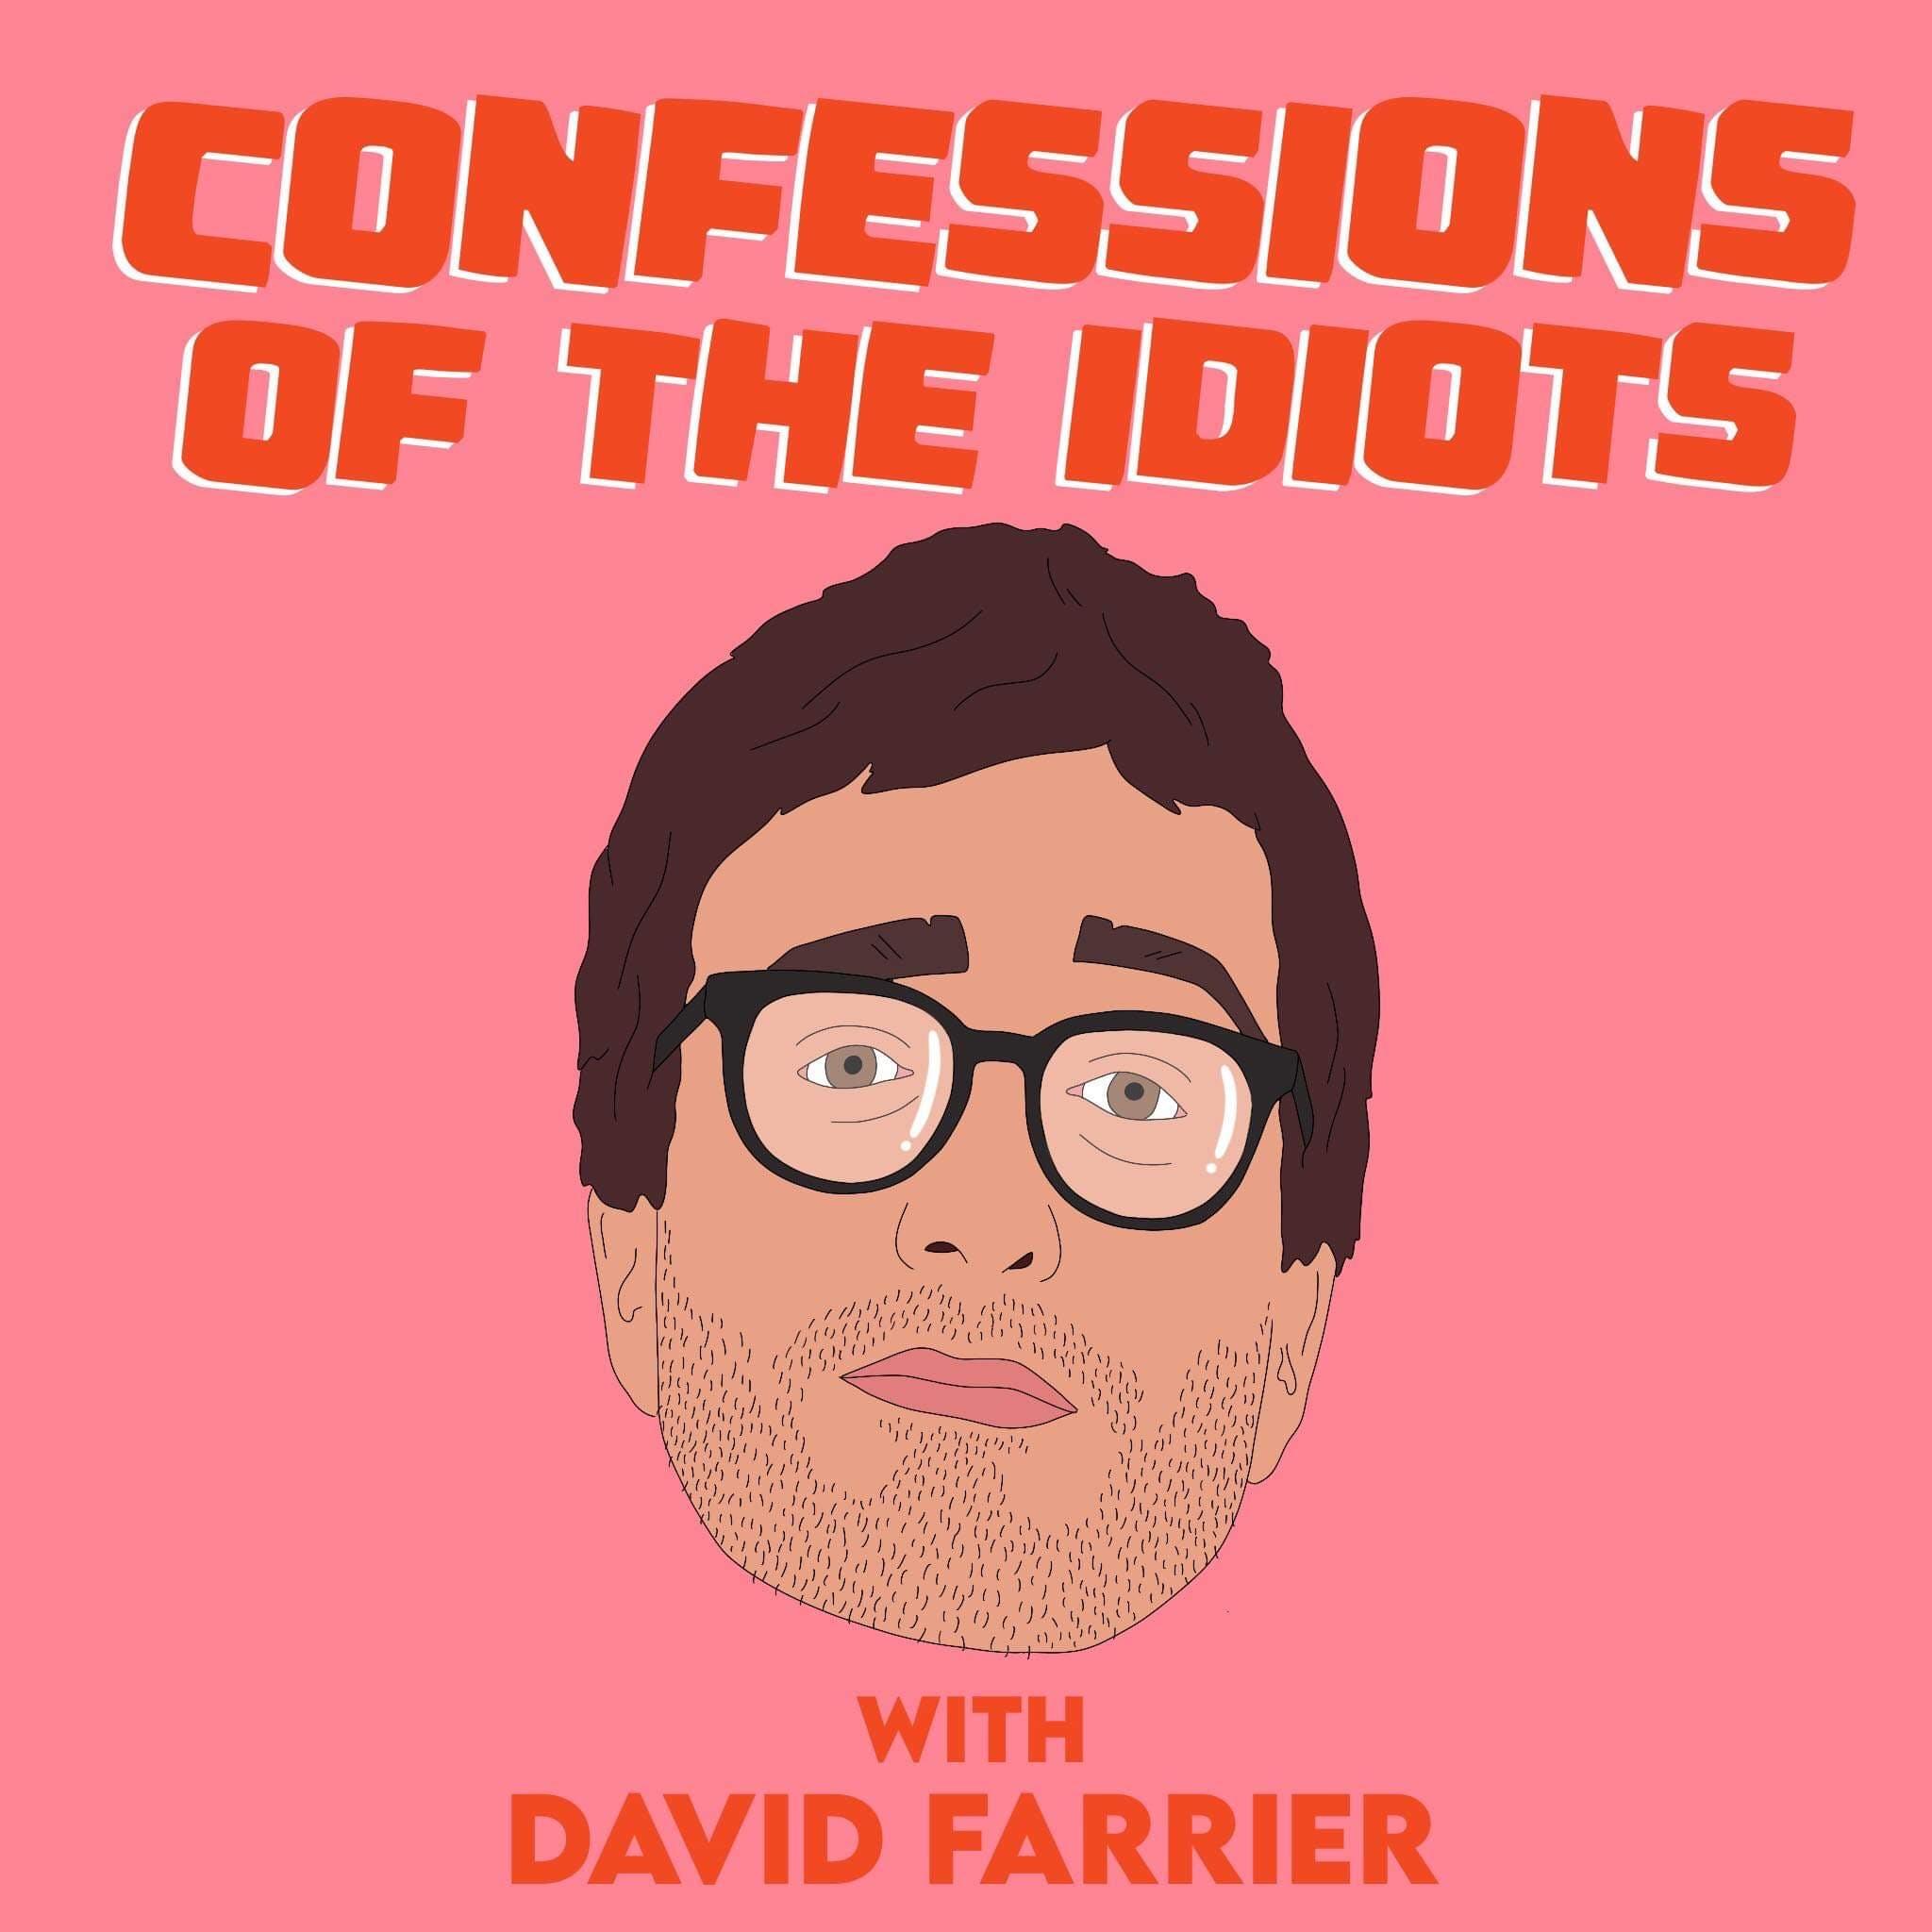 David Farrier